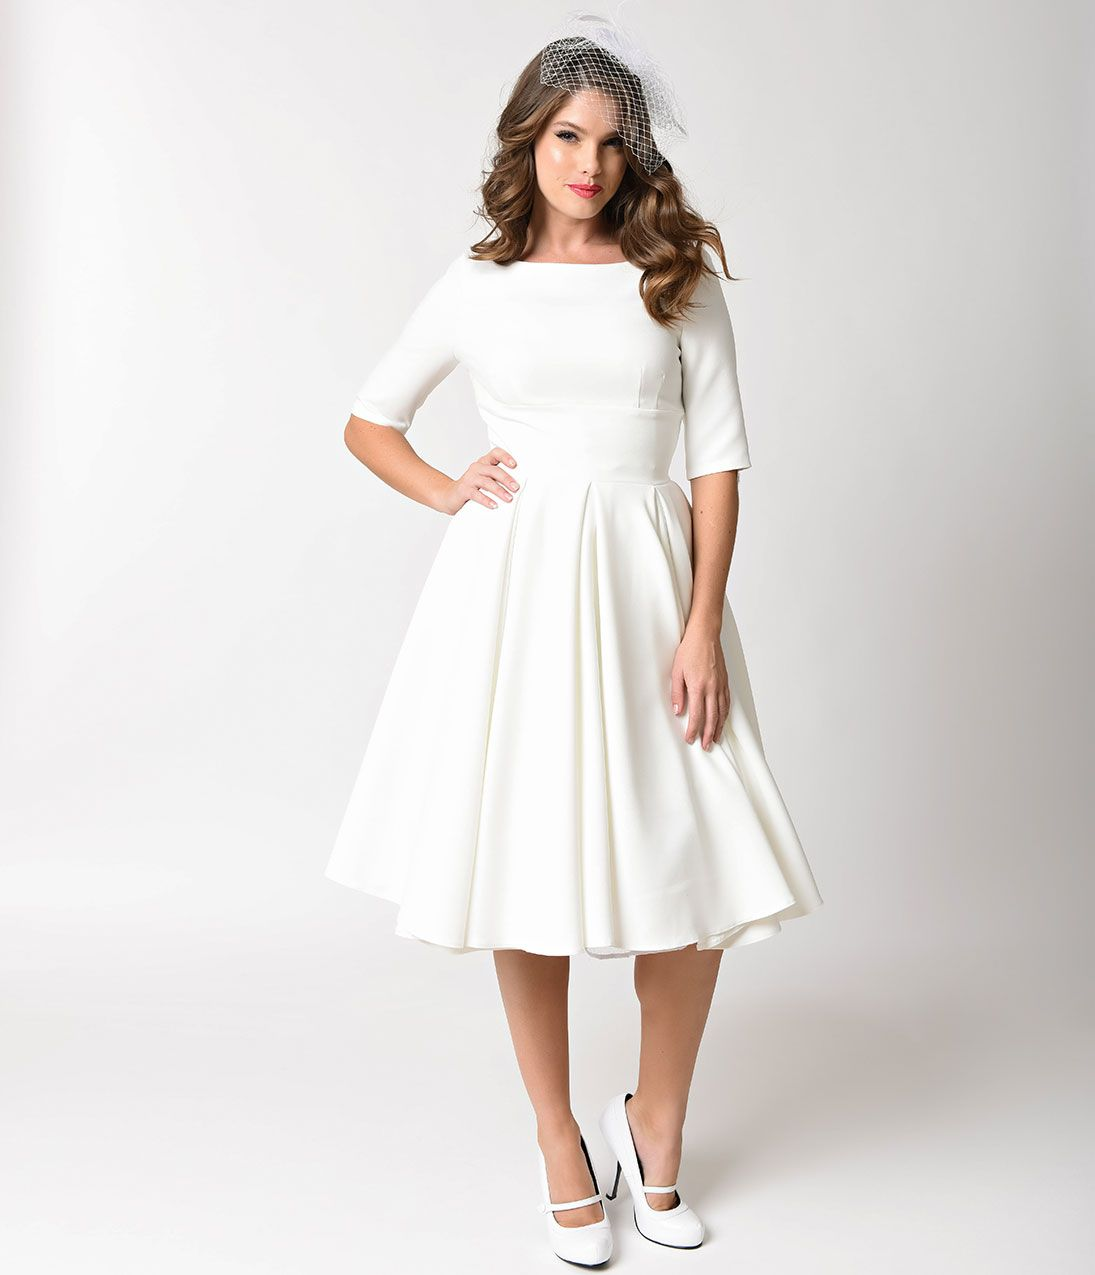 1950s style wedding dresses  s Wedding Dress s Style Wedding Dresses Rockabilly Weddings